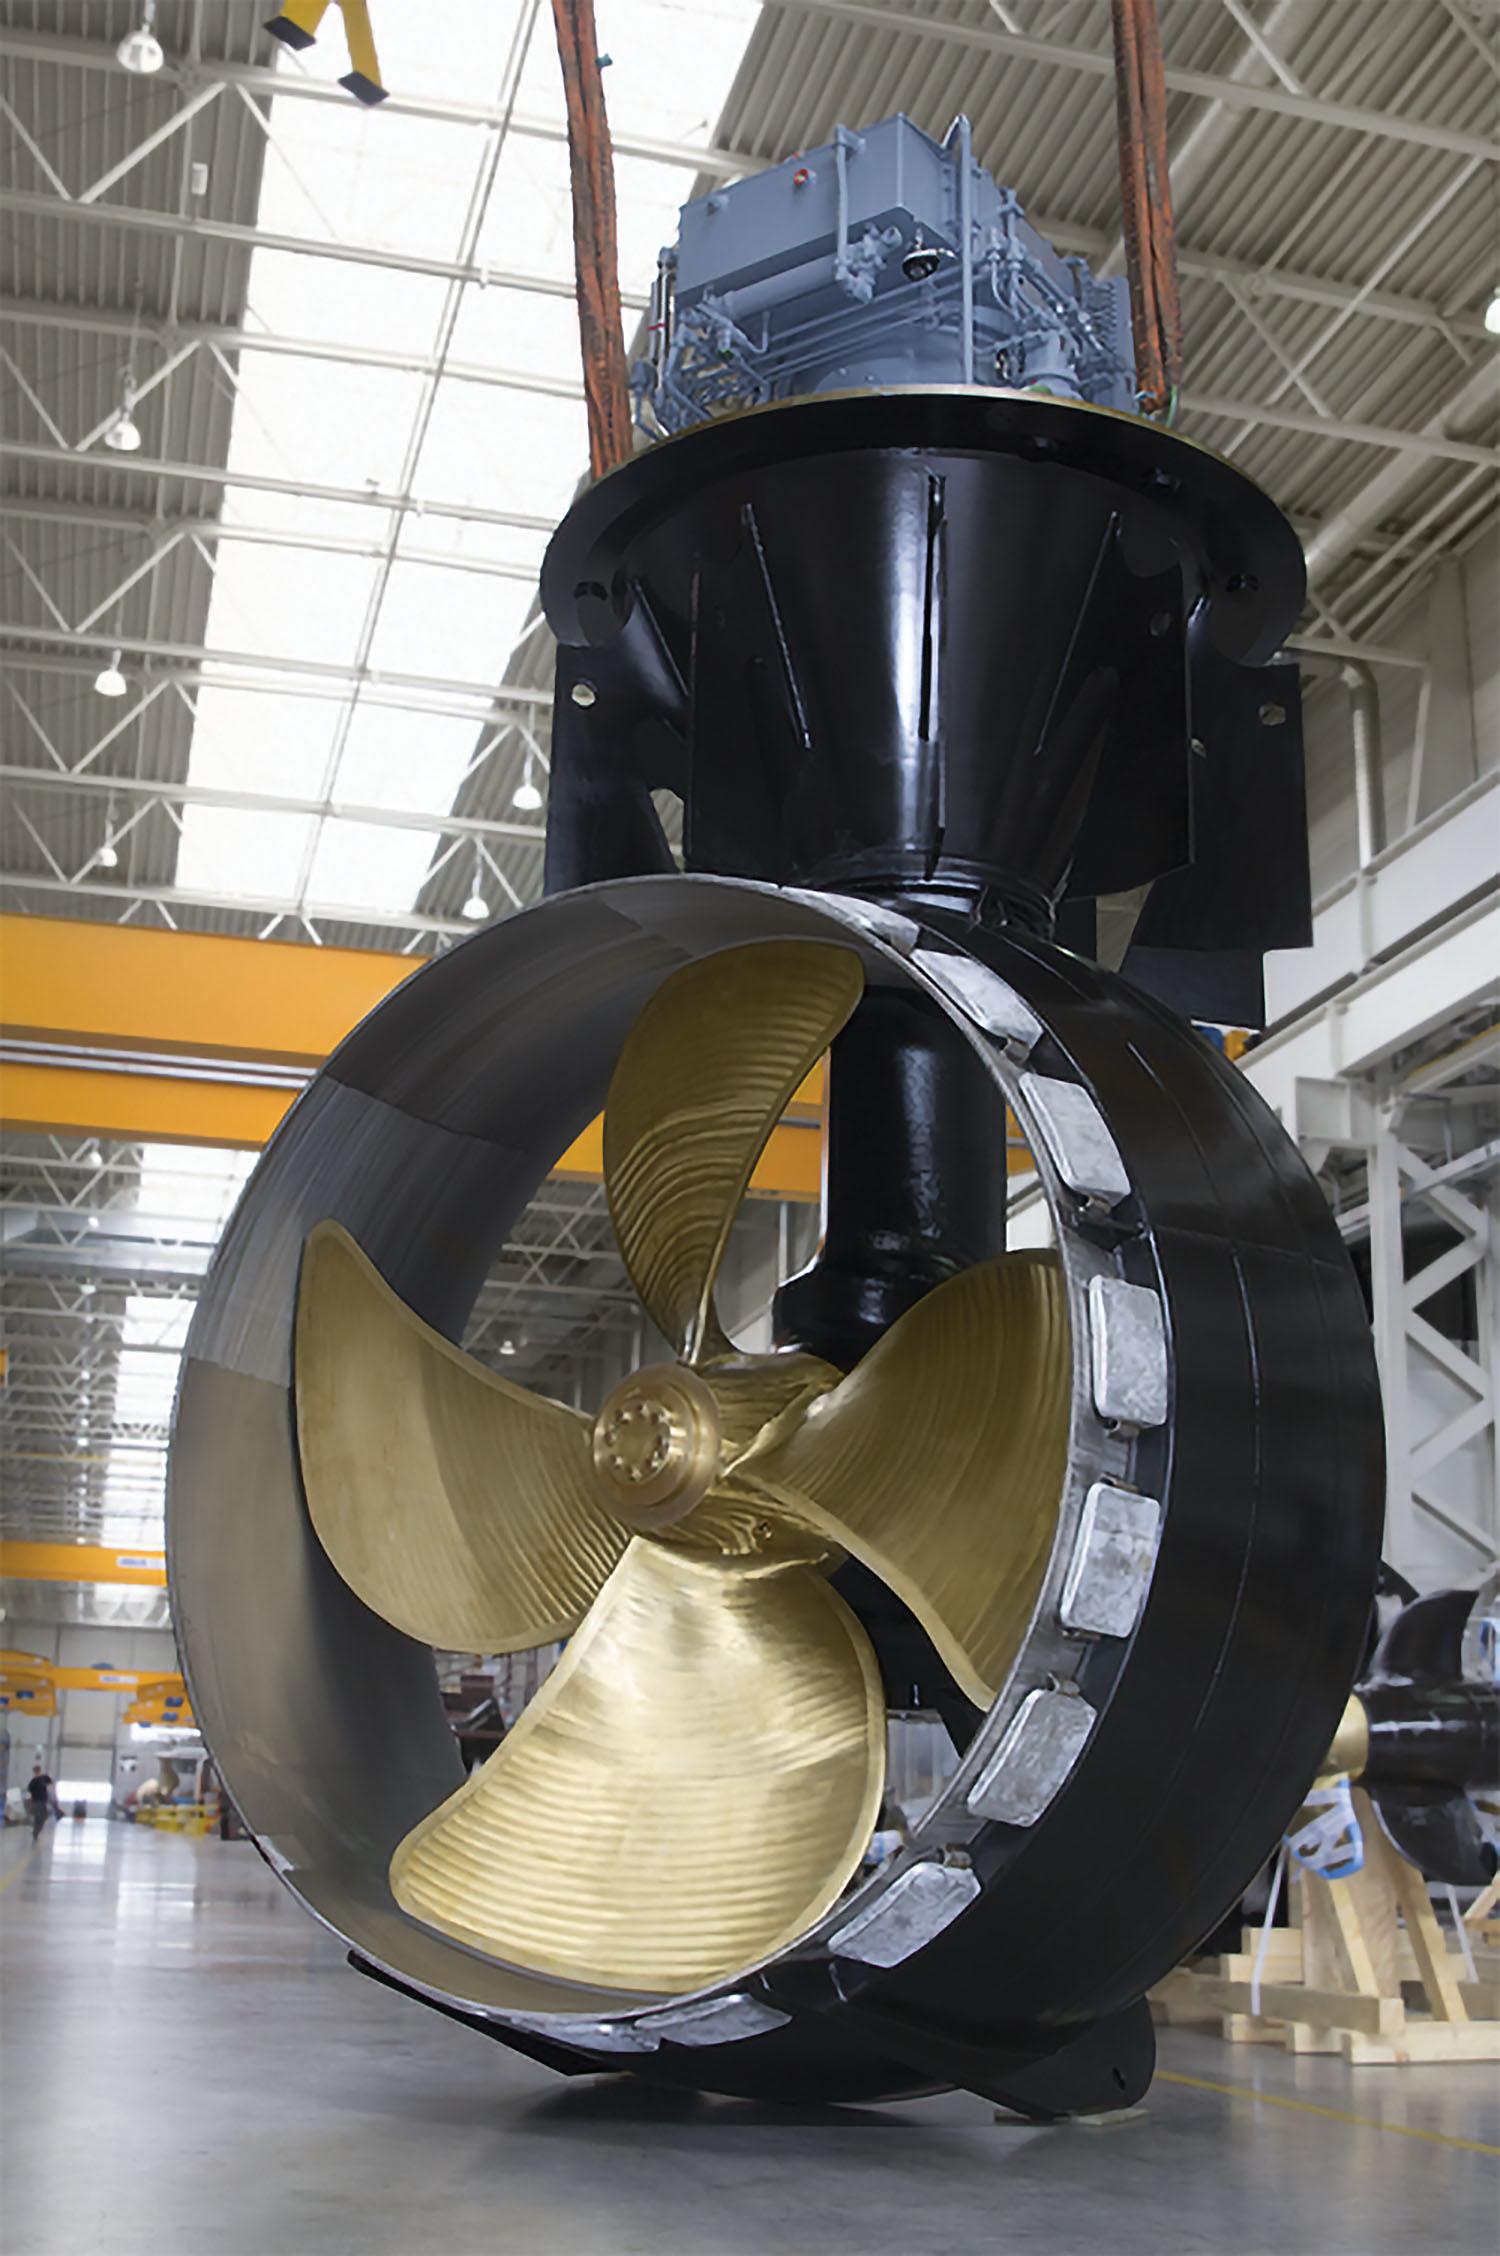 Mcallister Tug Propelled By Schottel